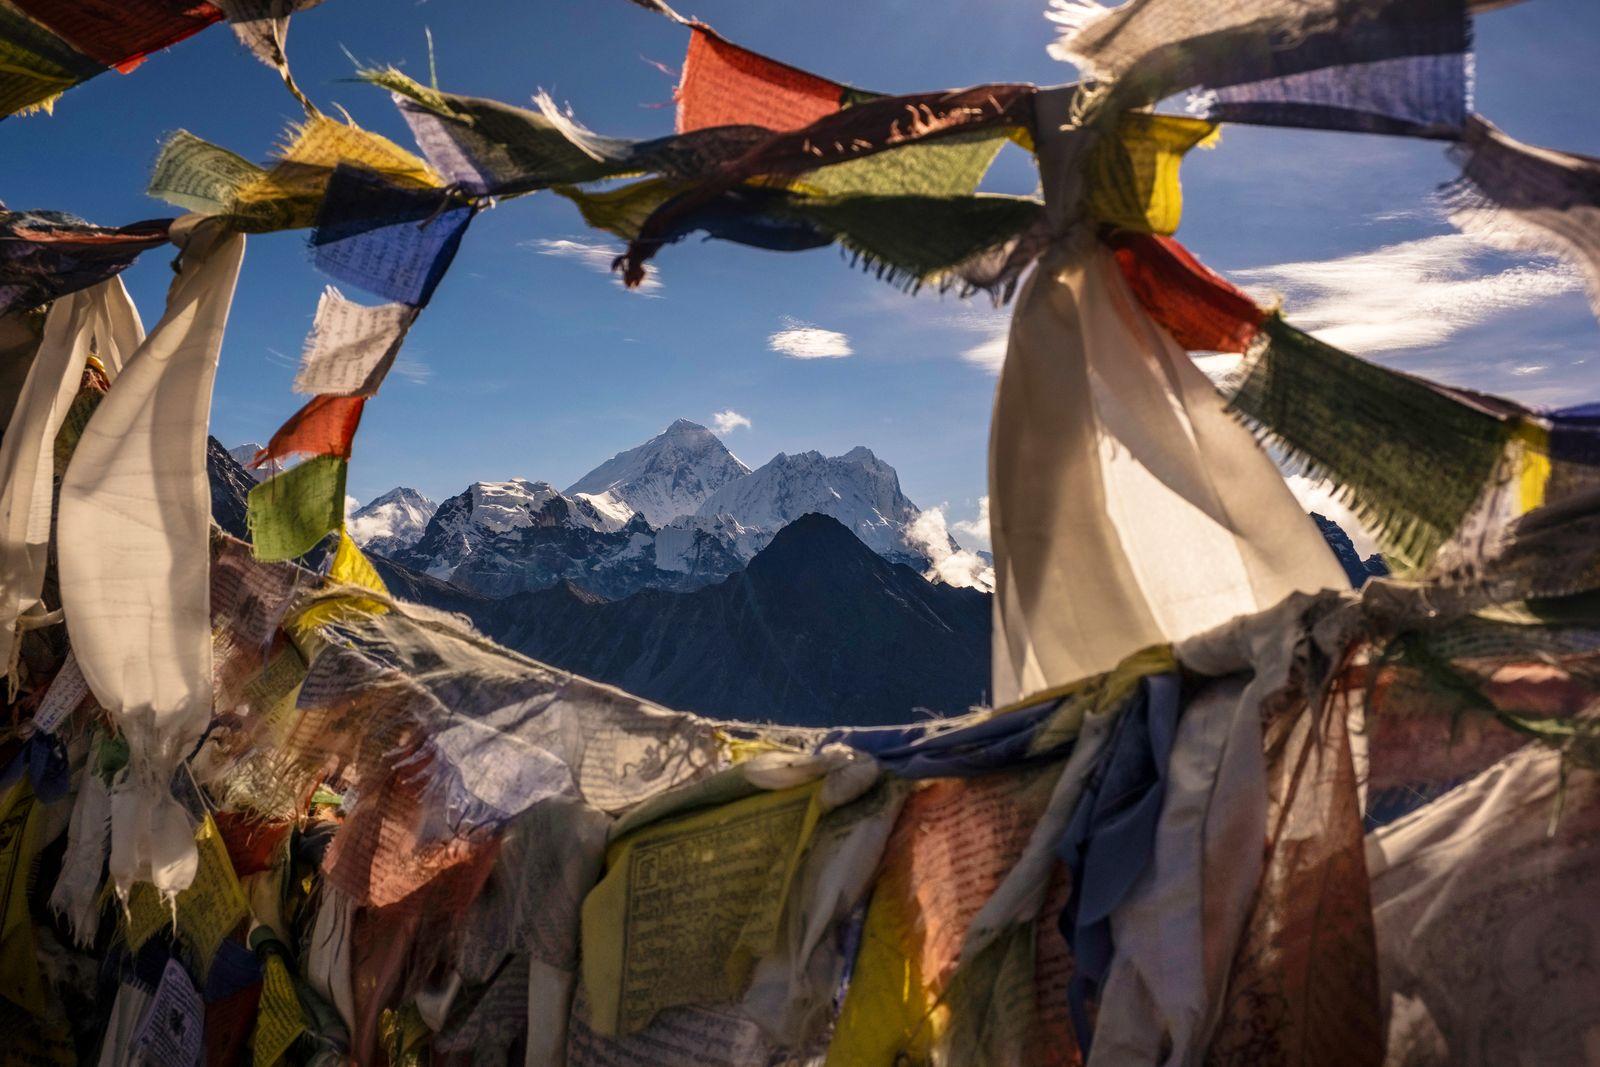 Summit of Mt. Everest, seen from summit of Gokyo Ri, through